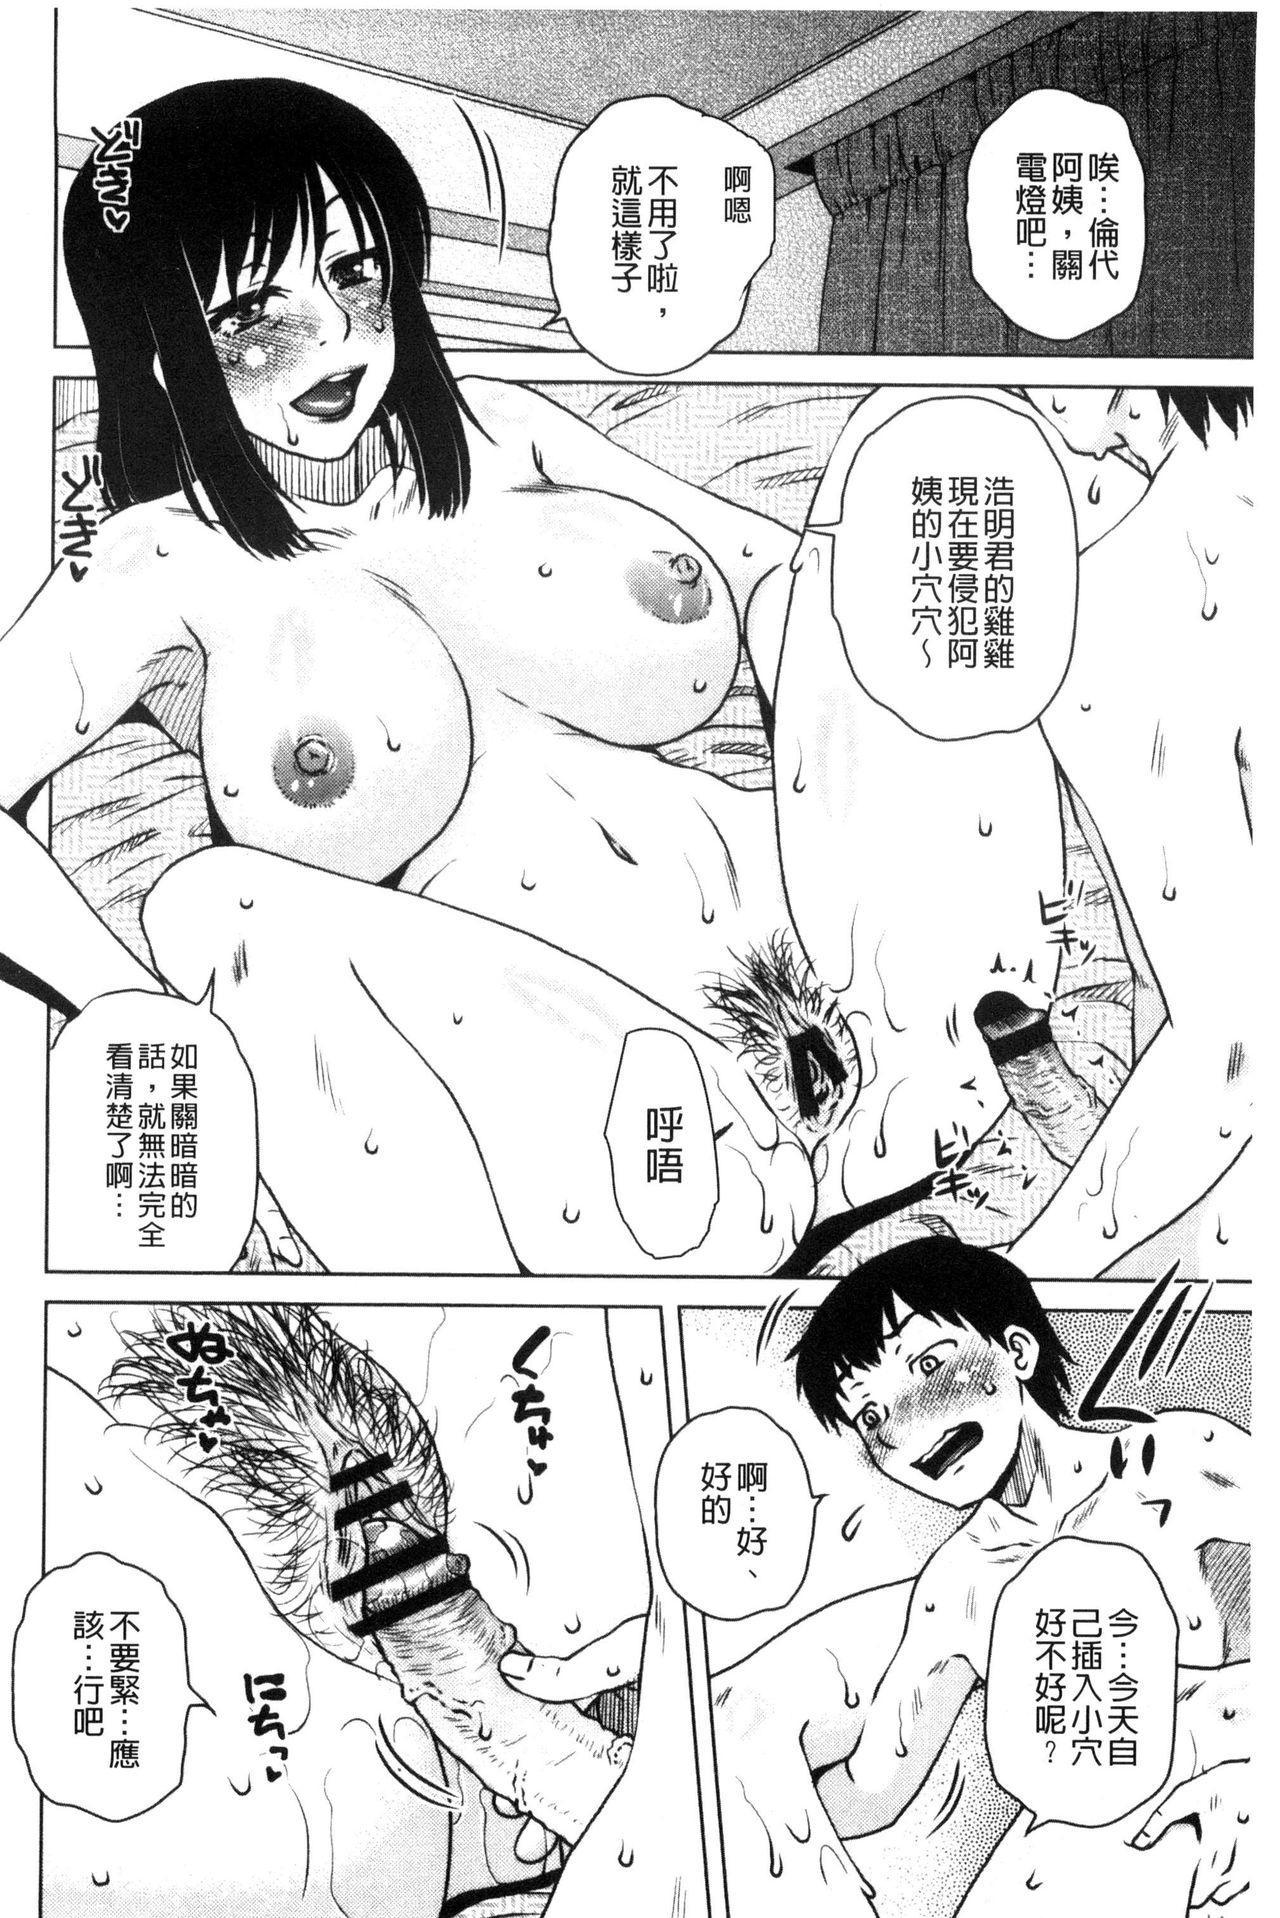 [Kurumiya Mashimin] Uchi no Shachou no Hamedere Inkatsu - Our President is HAME-DERE in Licentious sex life. [Chinese] 114